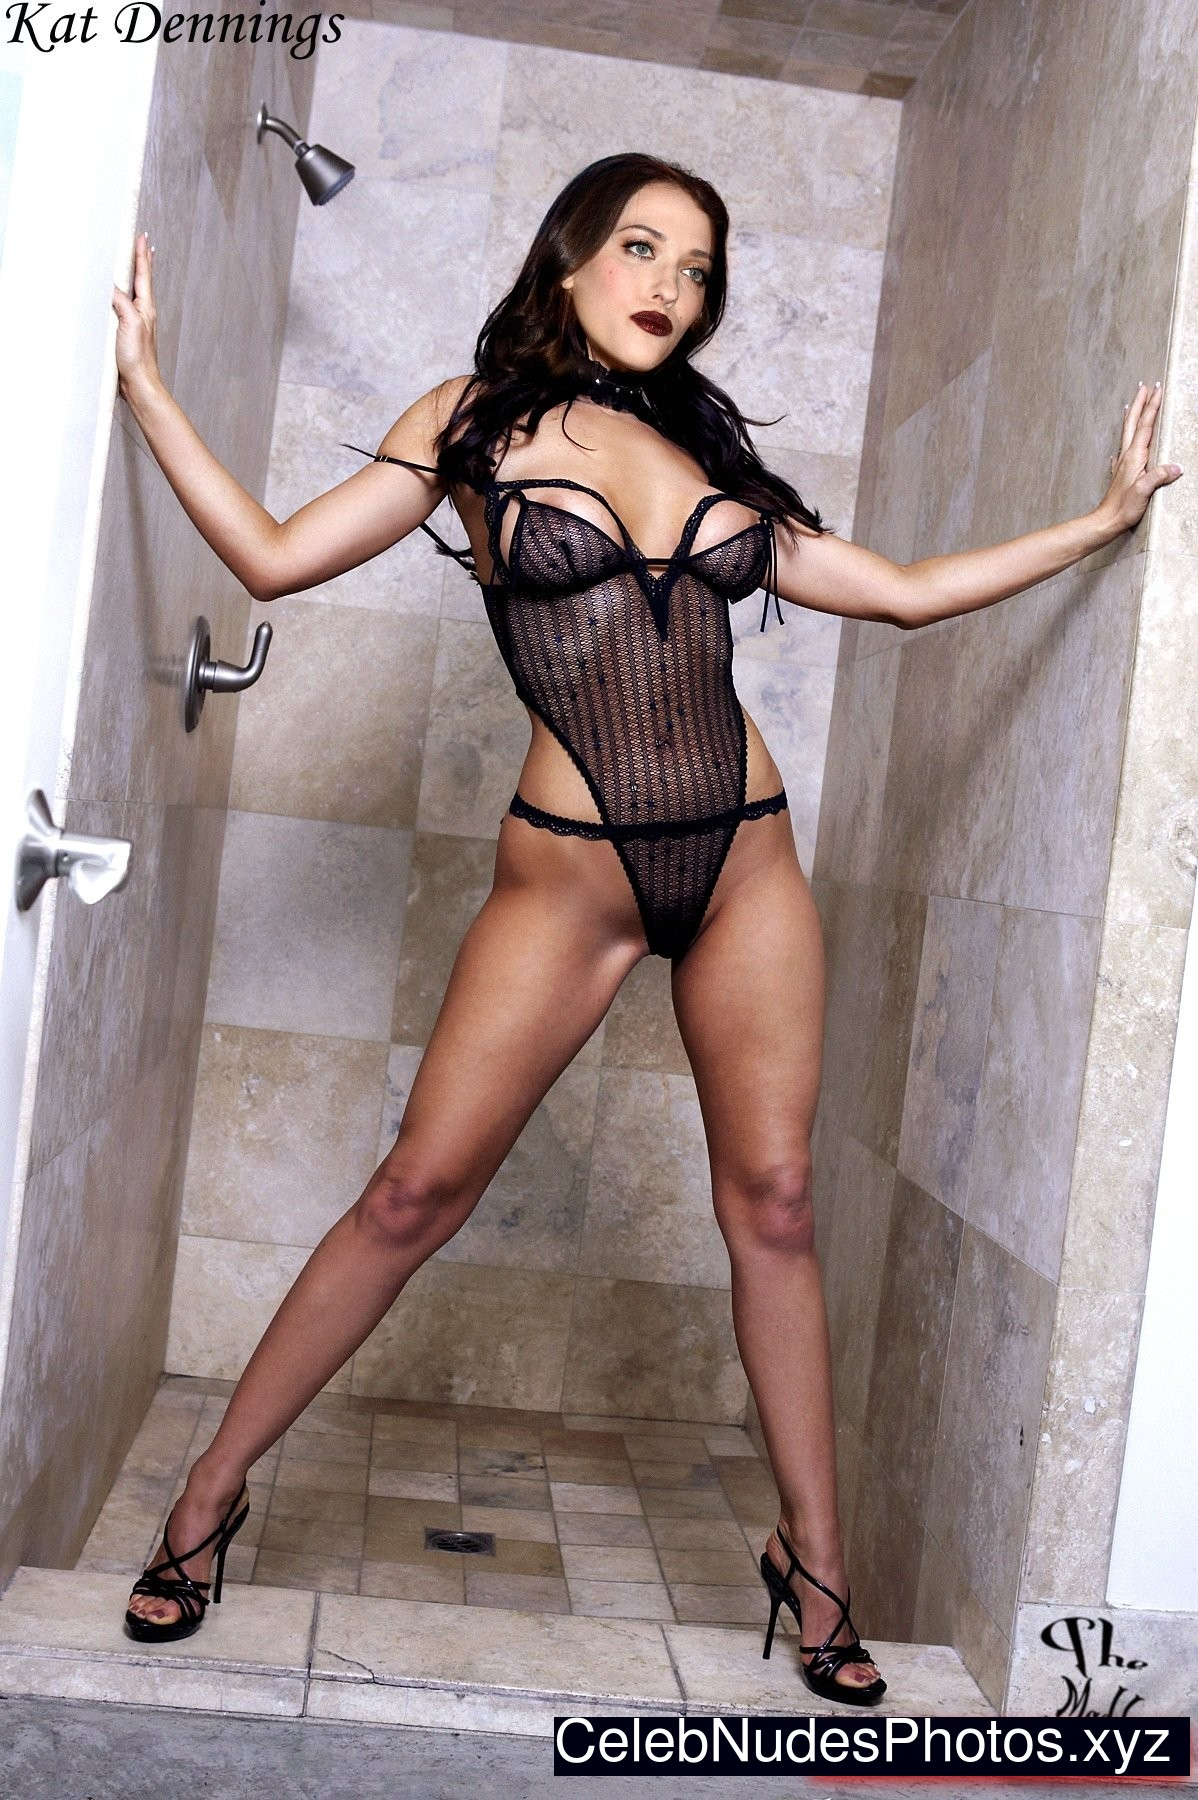 Cecilia Galliano Naked Stunning kat dennings free nude celebrities - celeb nudes photos